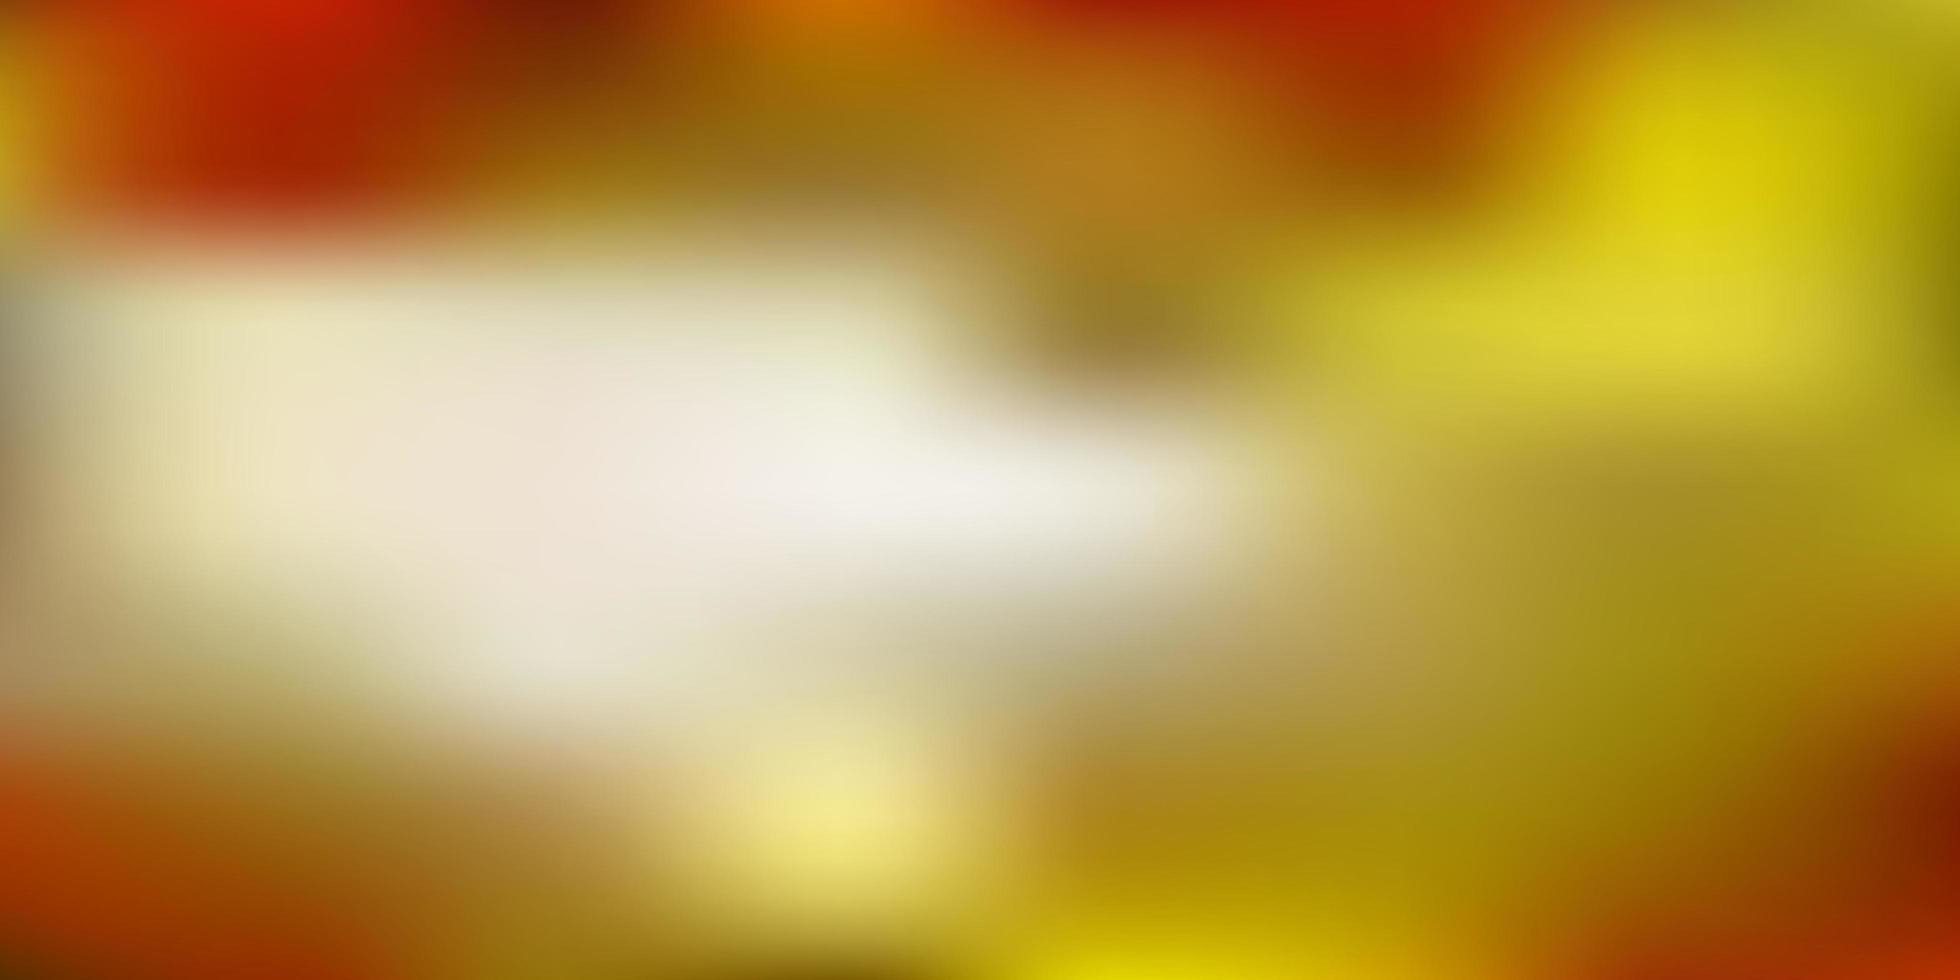 luz laranja vector turva padrão.